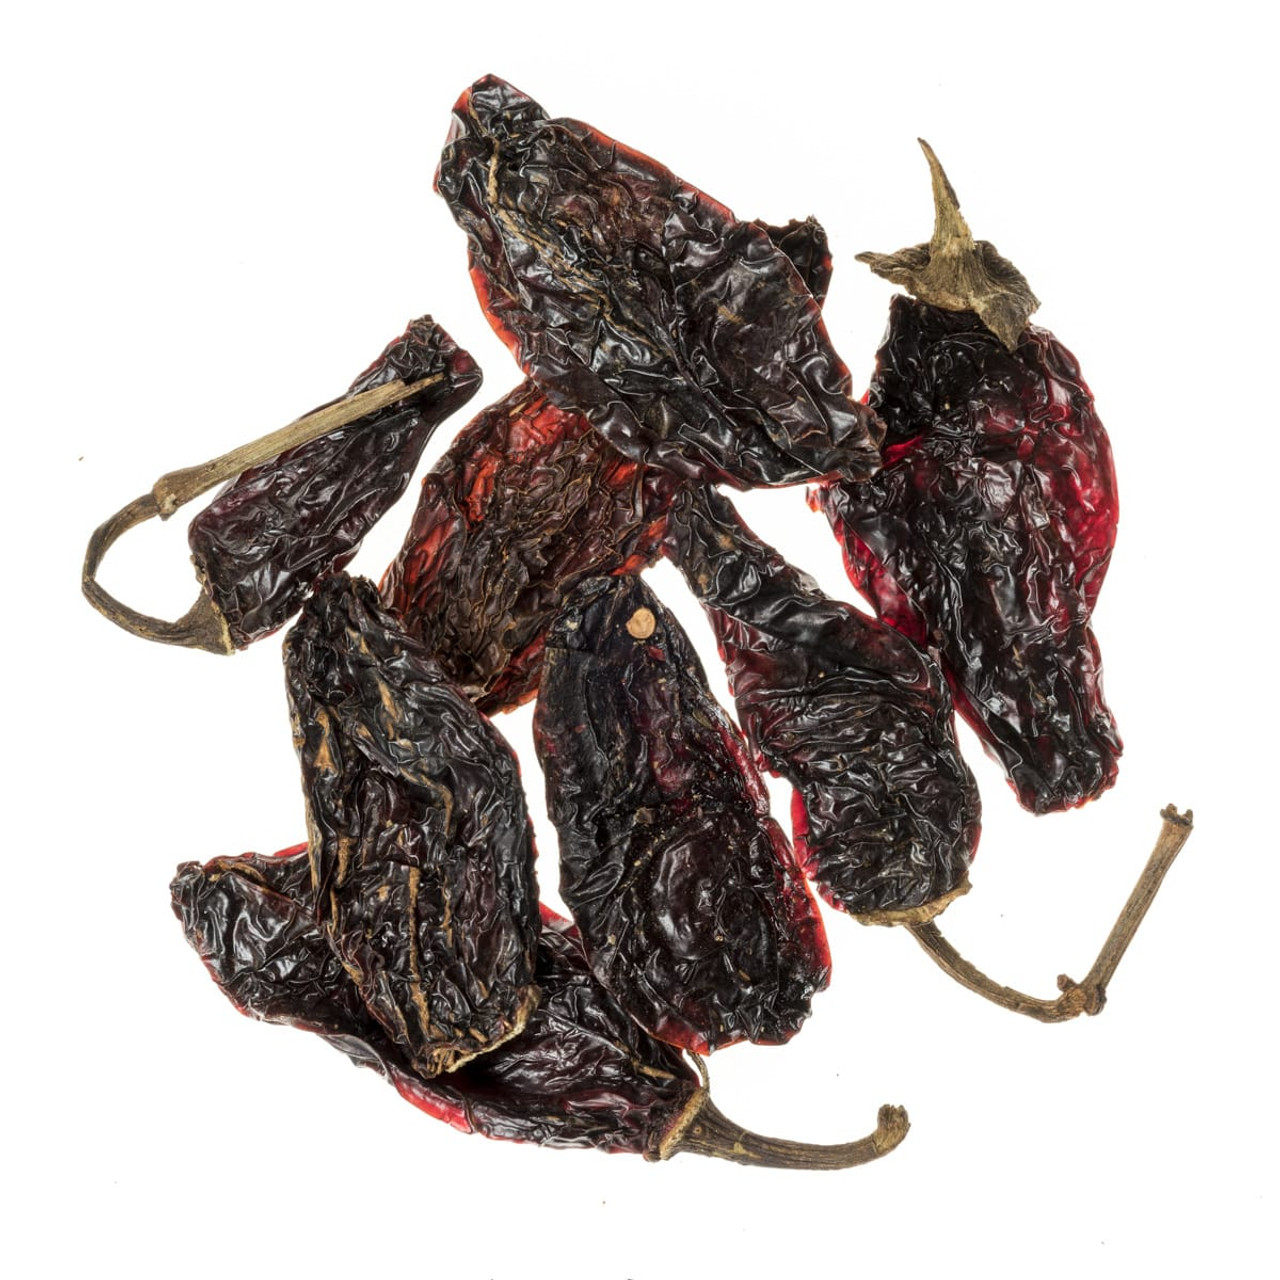 feeeb441378d morita-chiles-dried-whole  79840.1299860286.jpg c 2 imbypass on